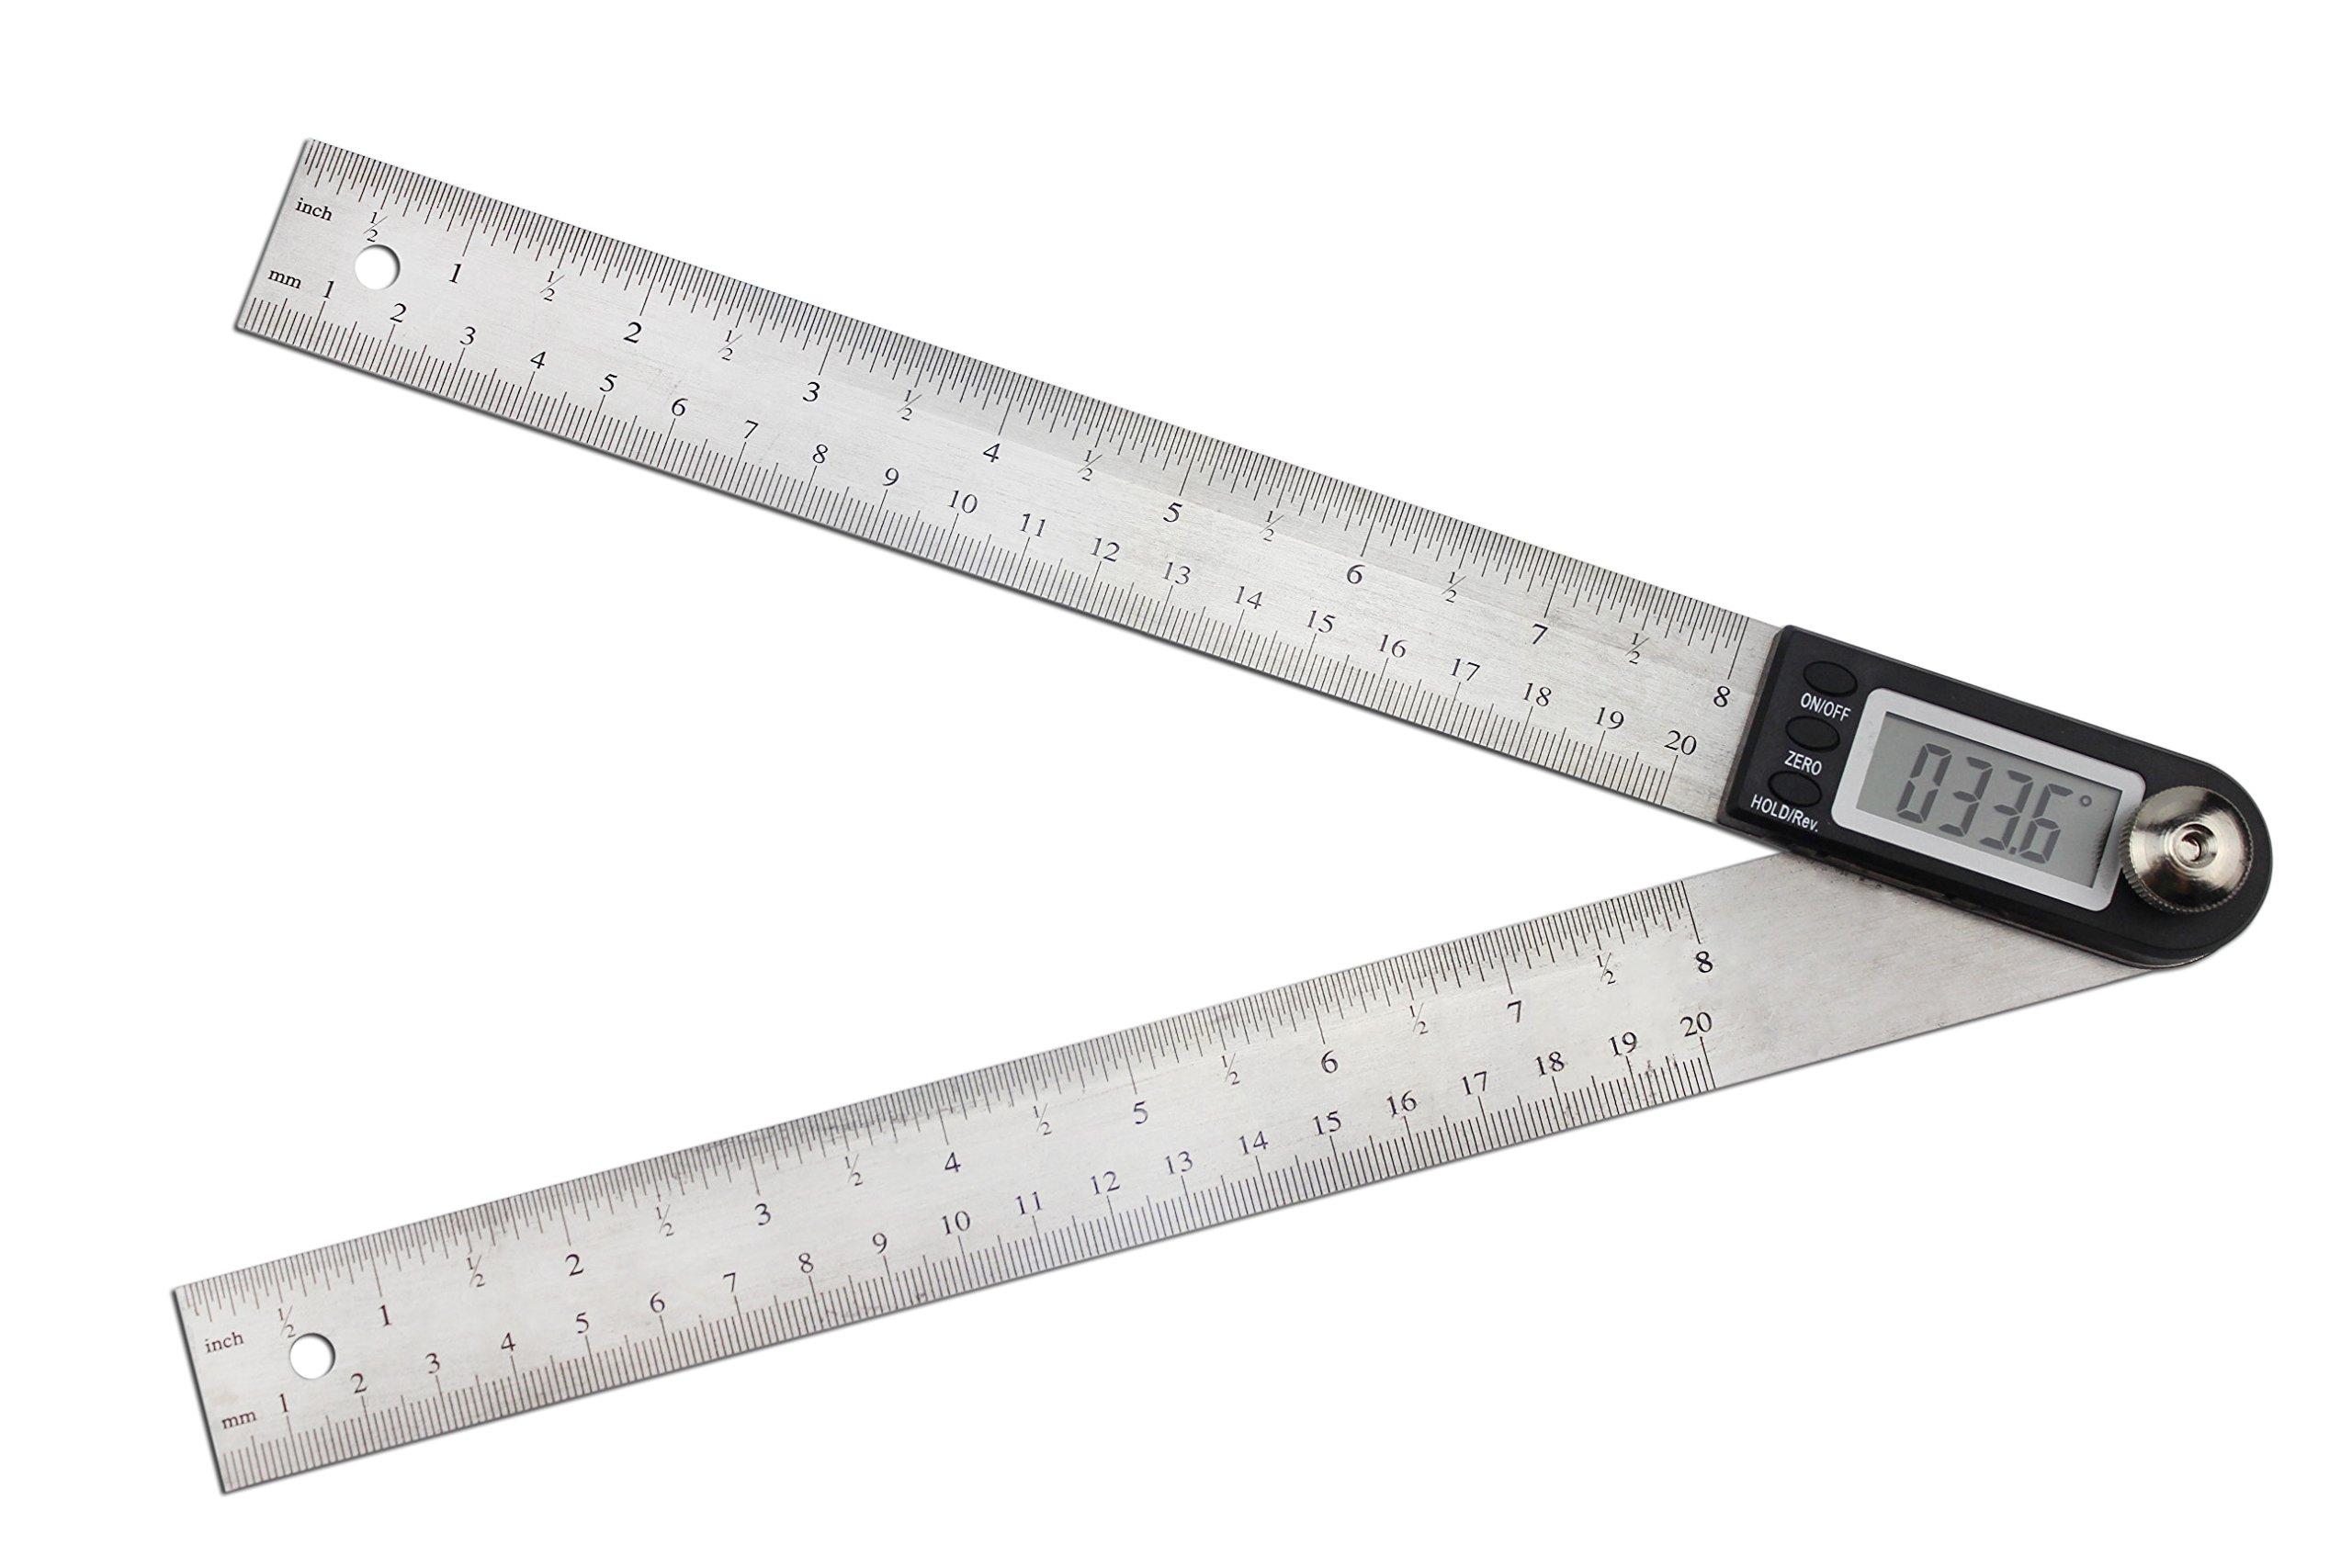 Angle Finder Electronic Protractor, STARRICH Digital Goniometer Miter Gauge Ruler (8inch/200mm)